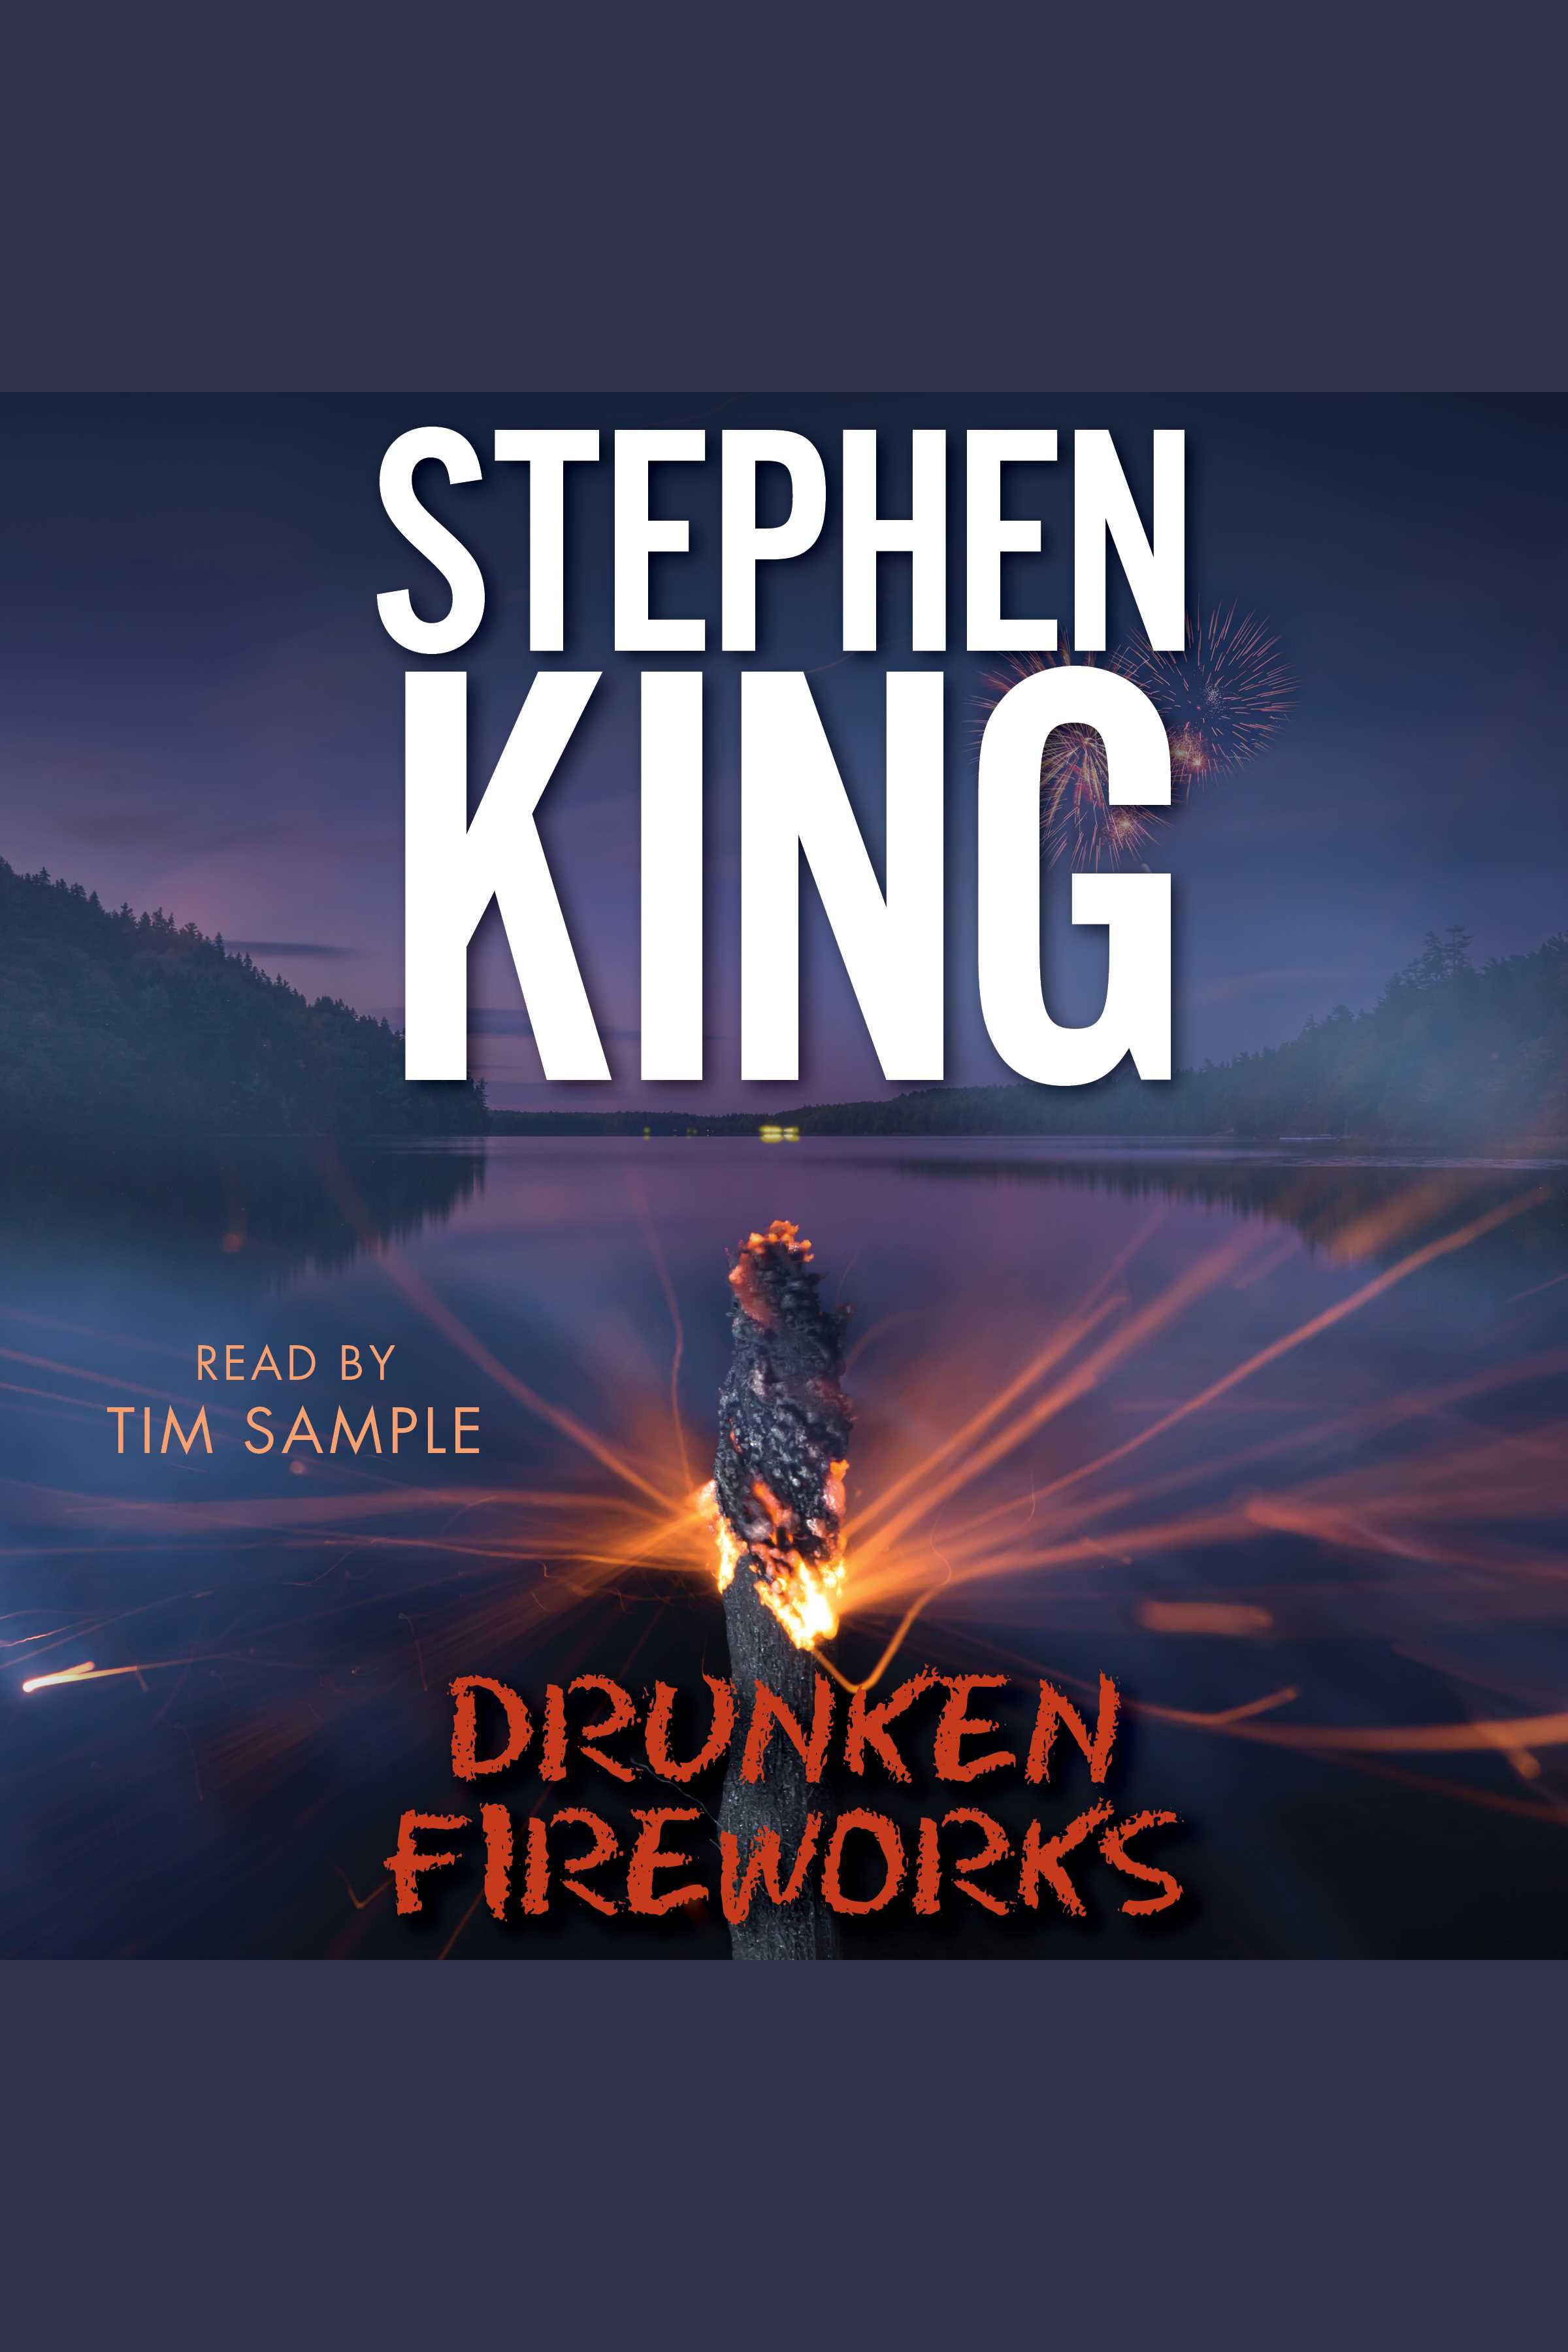 Drunken fireworks cover image